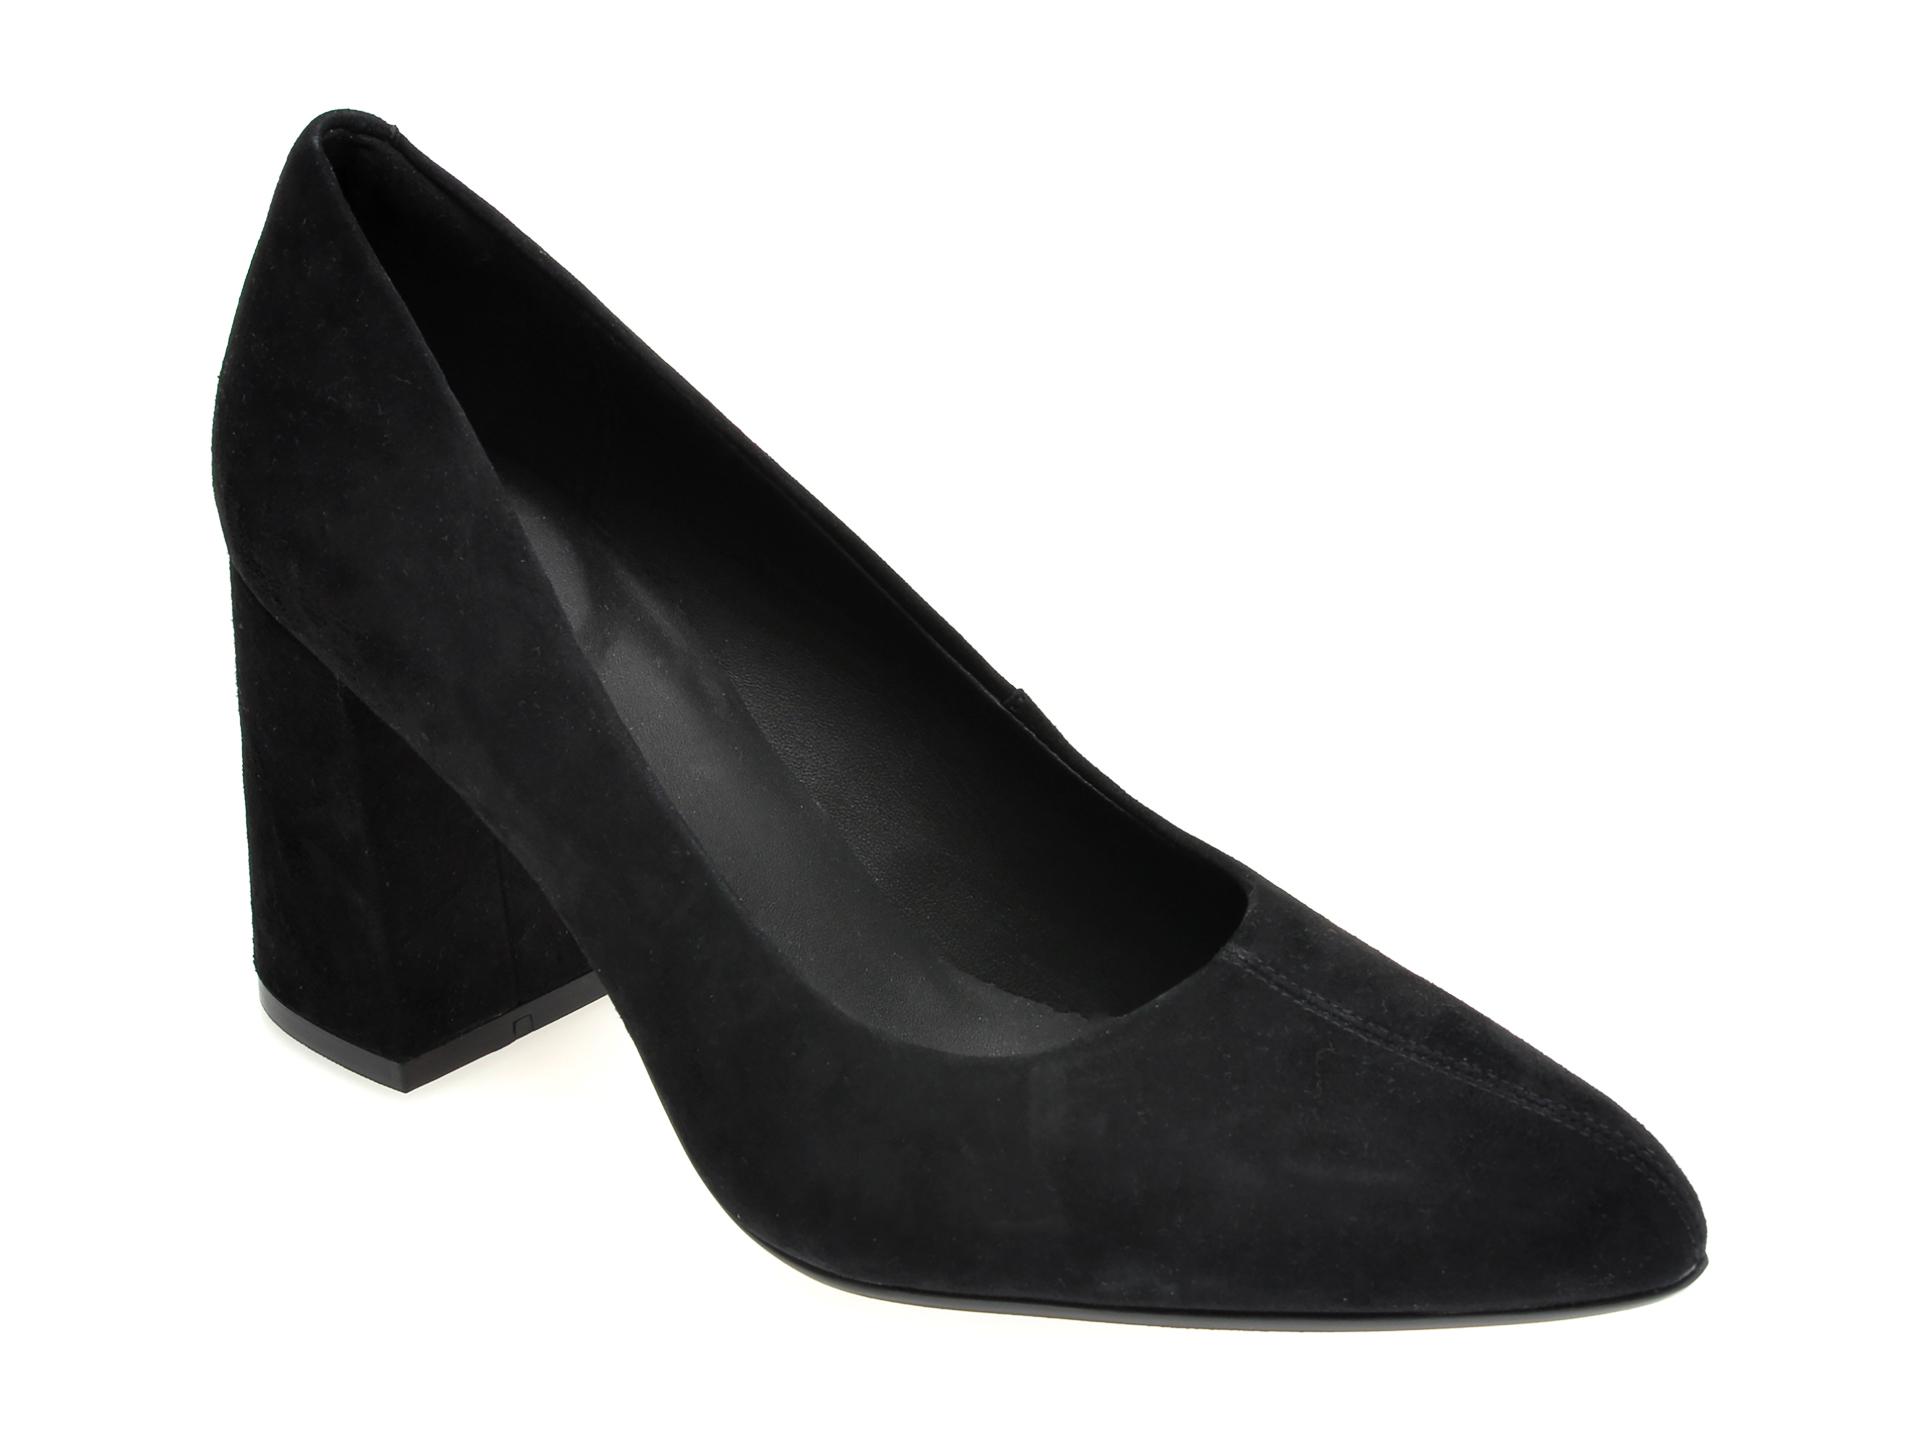 Pantofi CLARKS negri, LAI85CO, din piele intoarsa